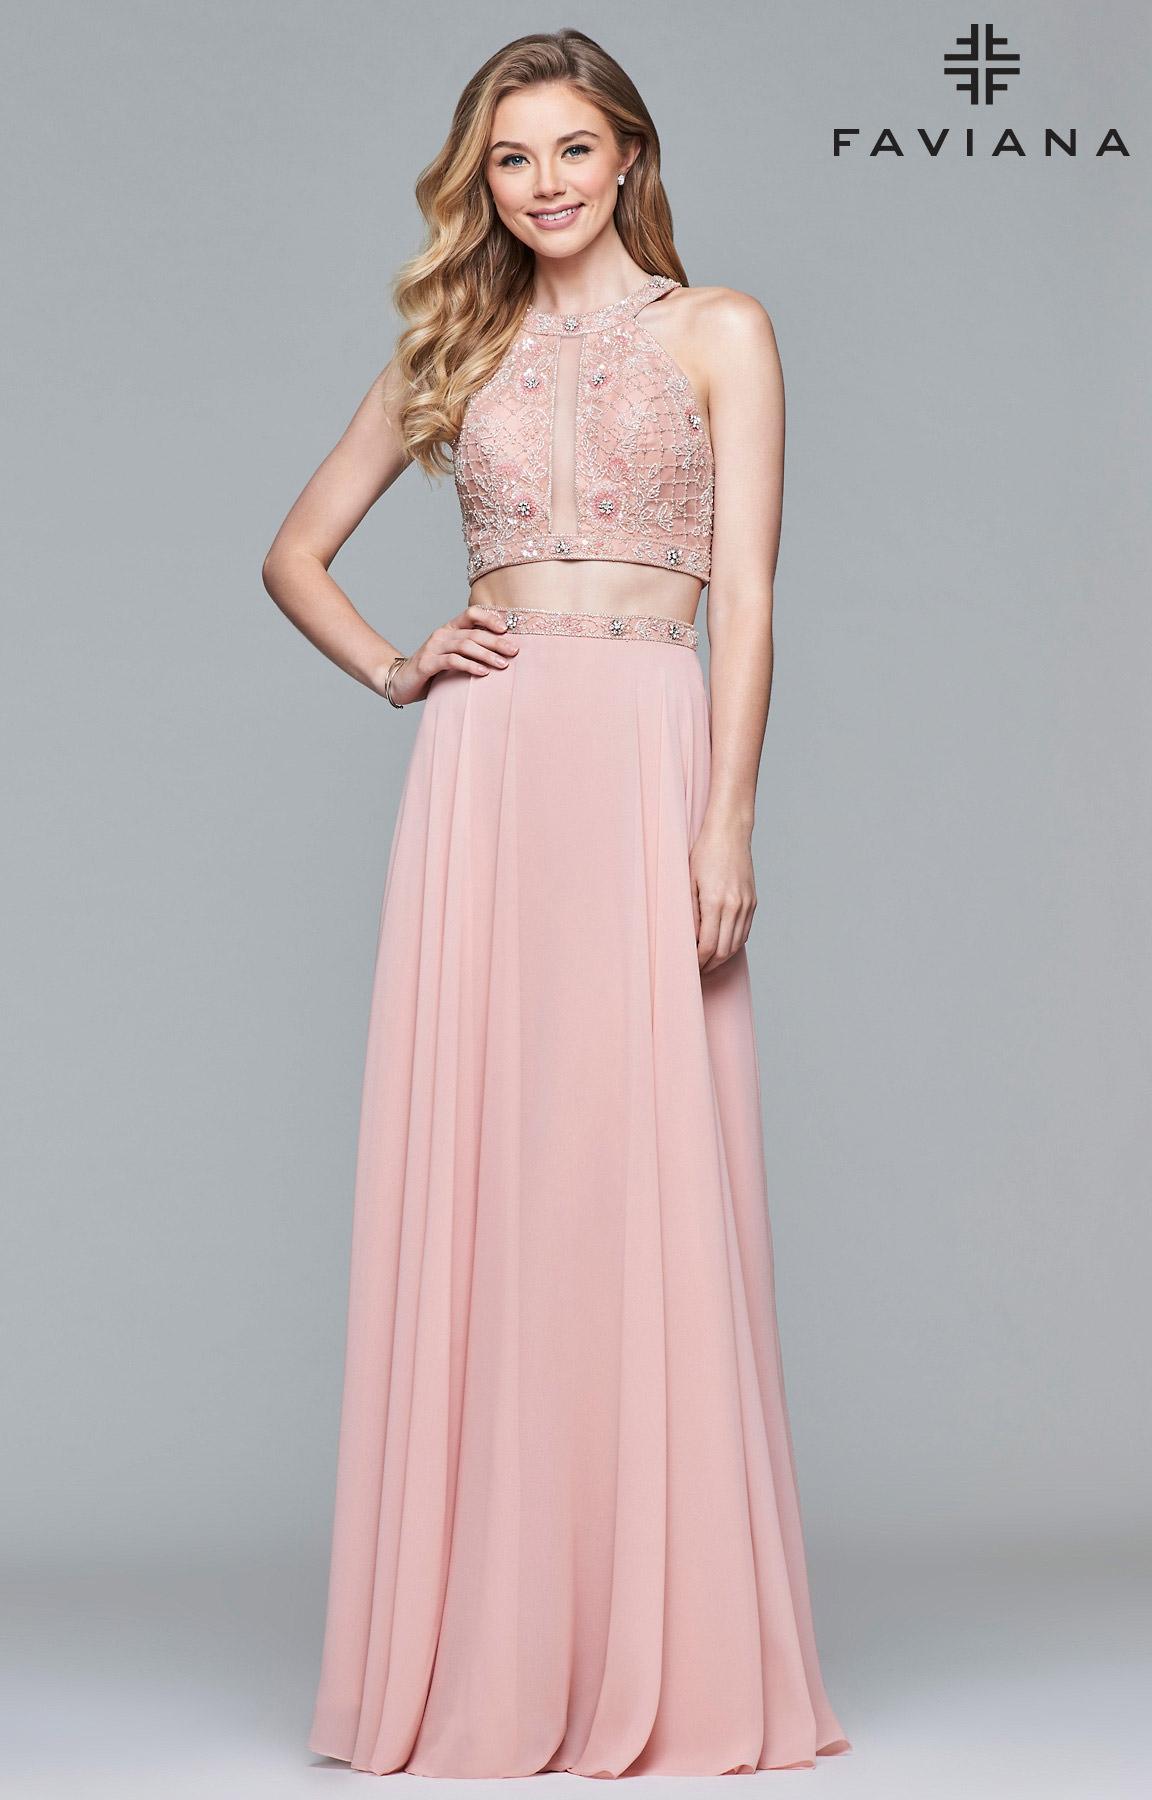 Faviana 10059 - 2 Piece A-Line Chiffon Prom Dress